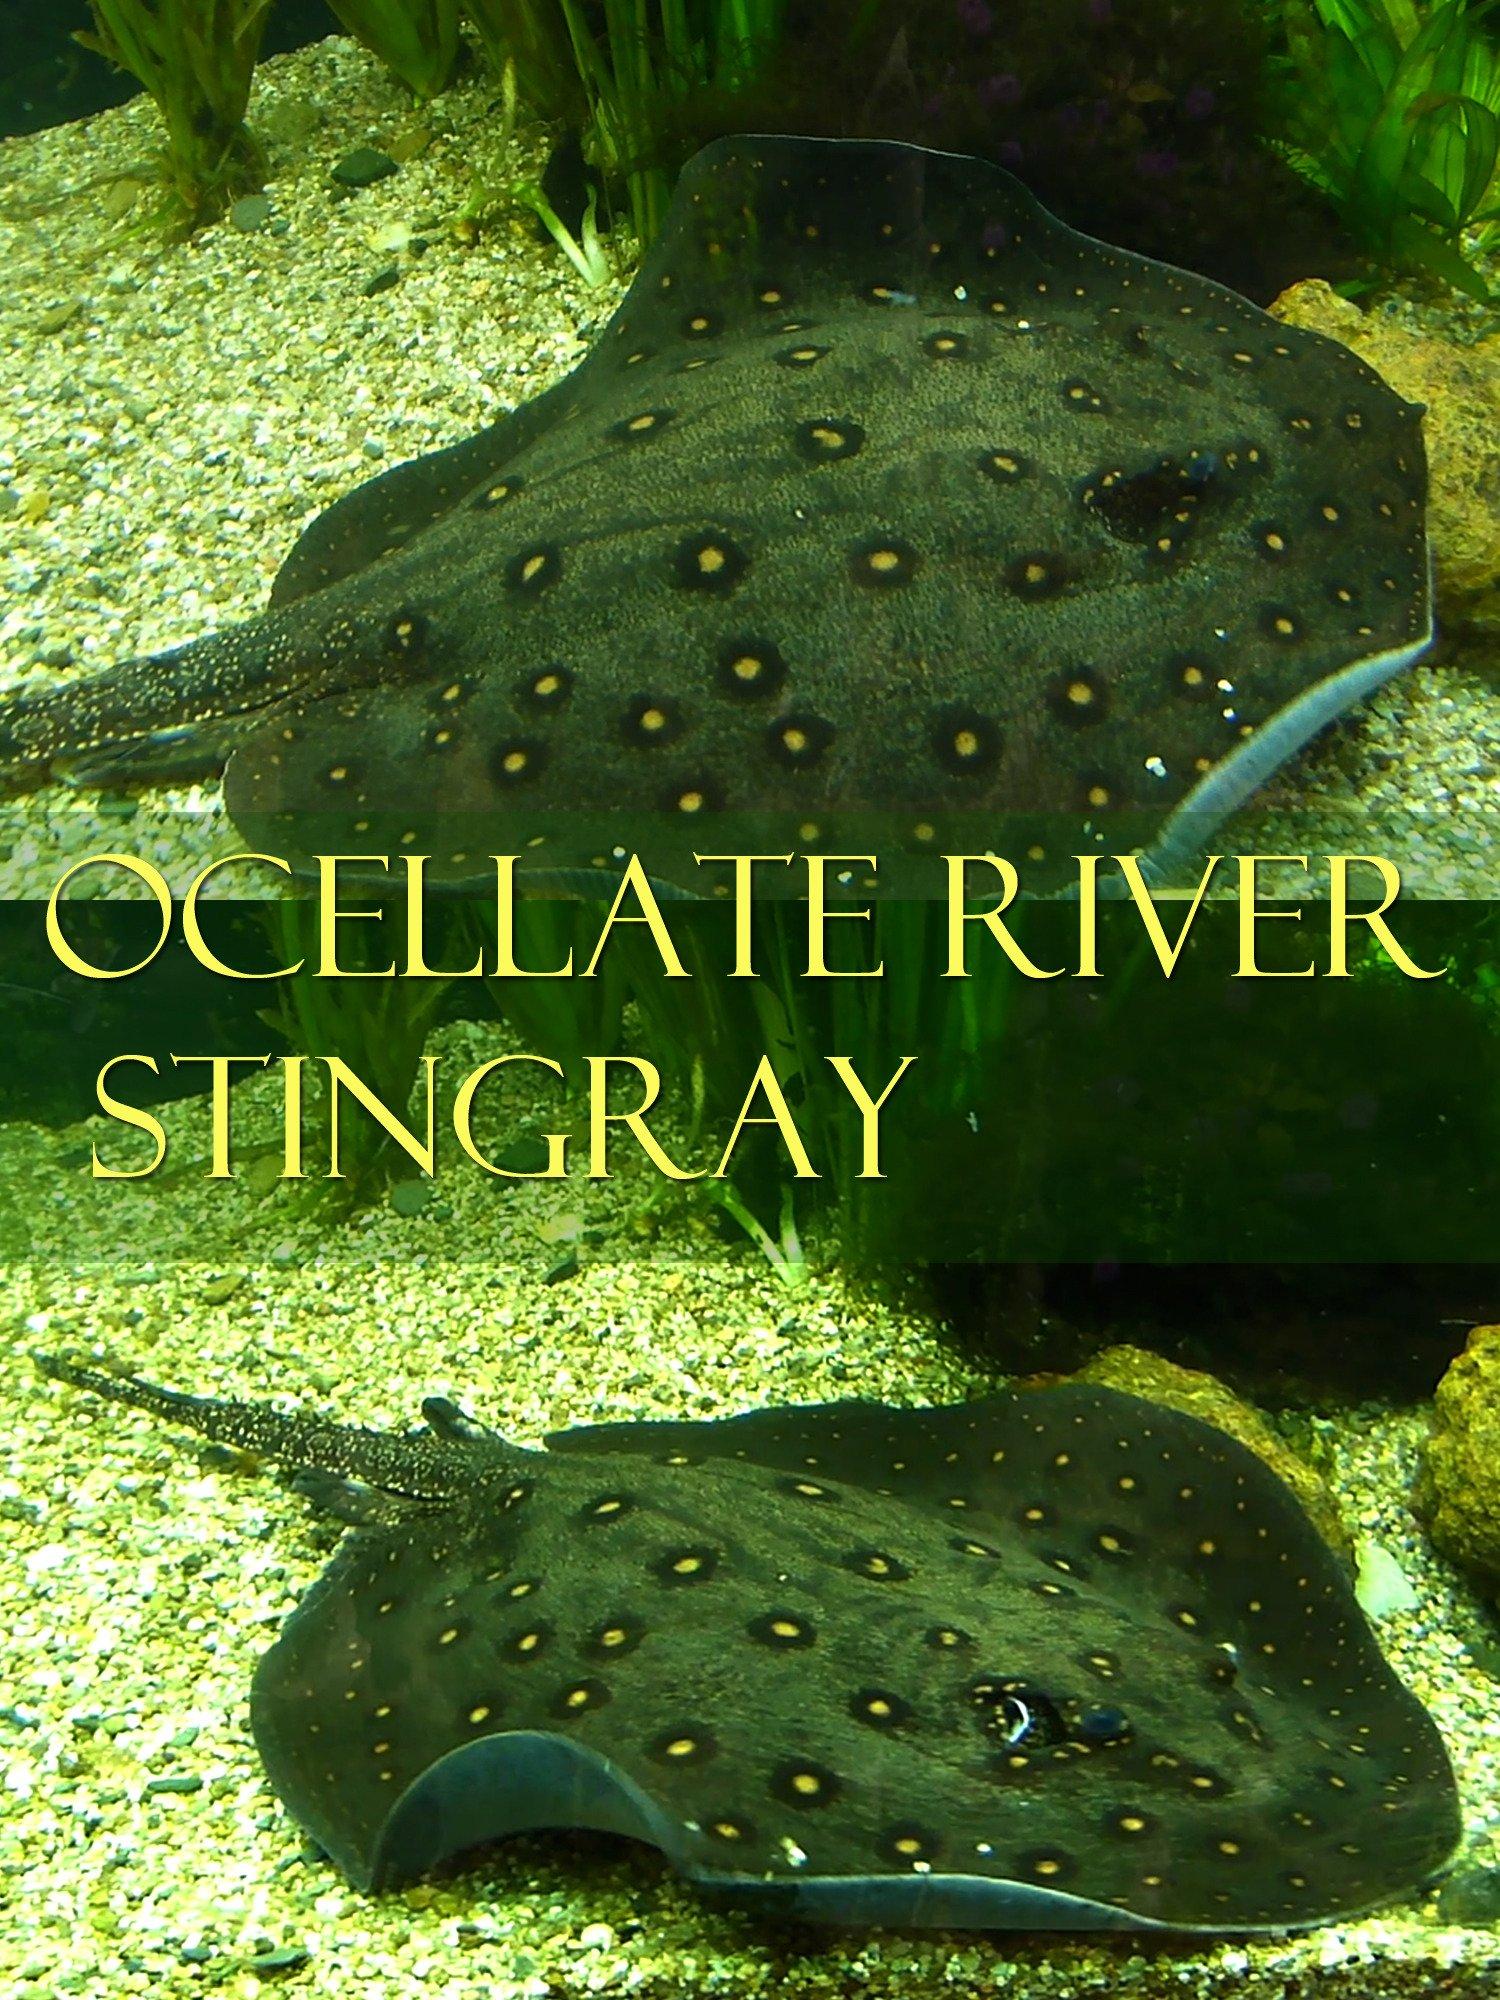 Ocellate river stingray on Amazon Prime Instant Video UK